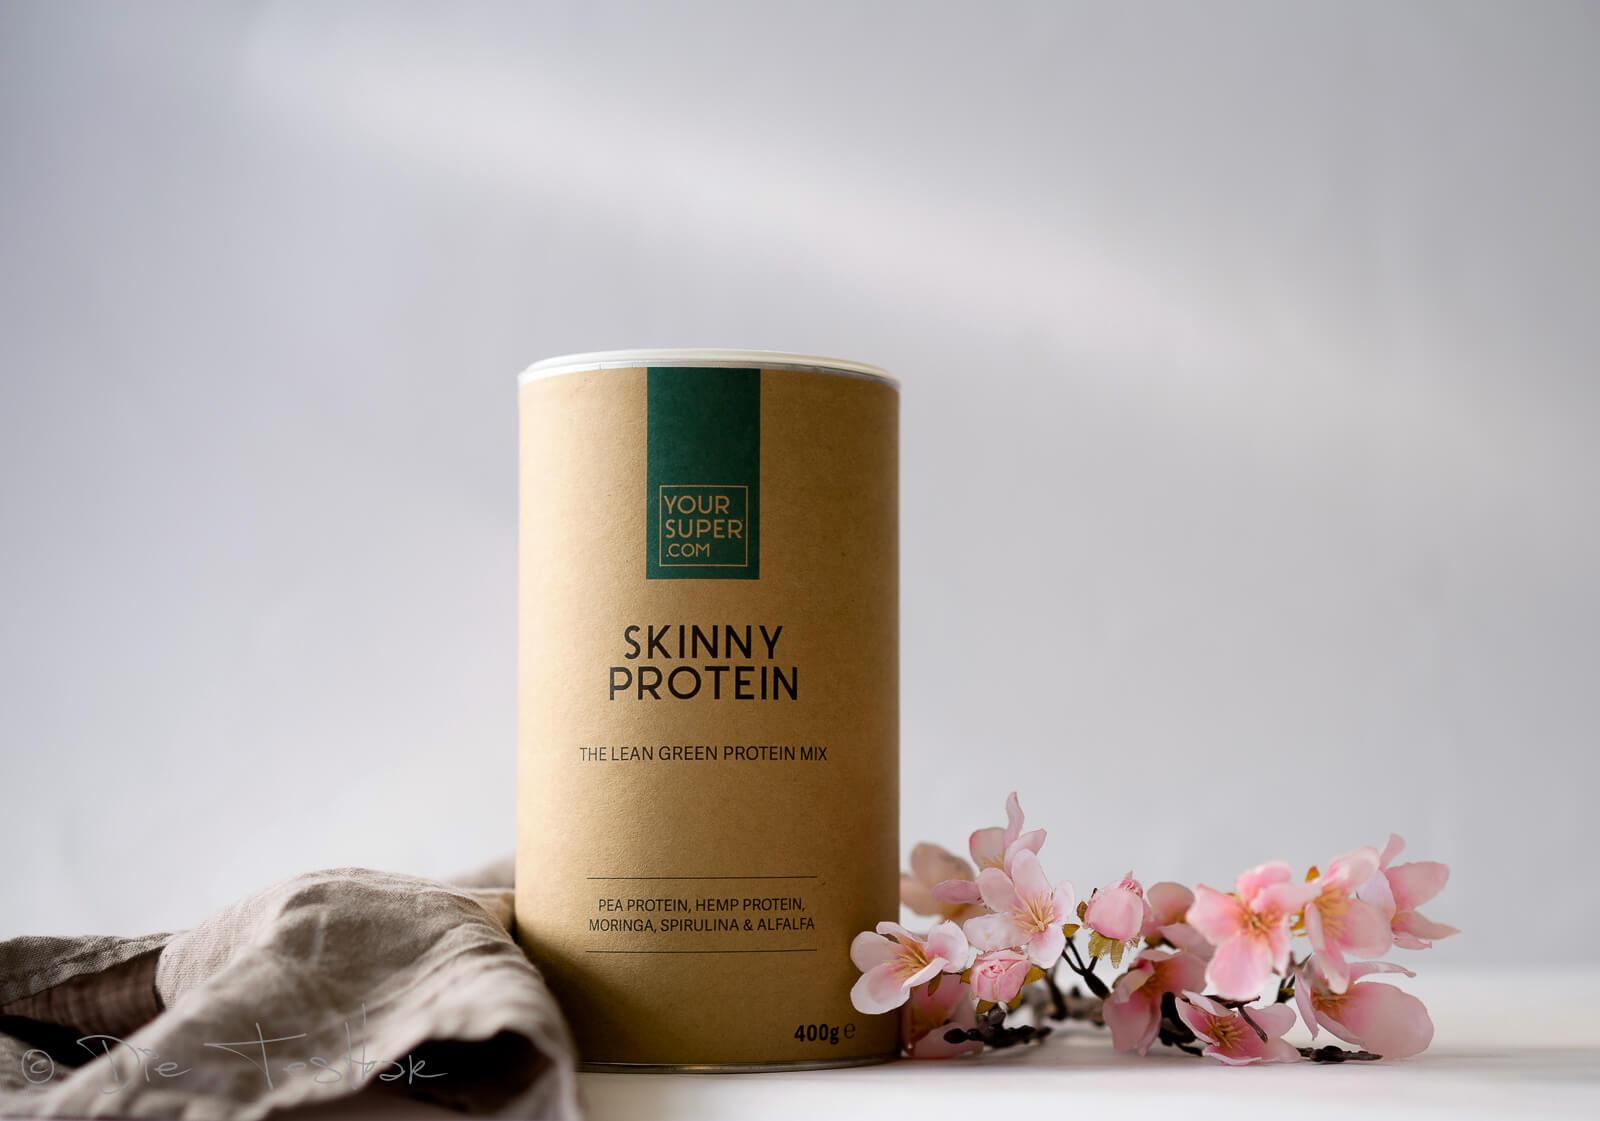 SKINNY PROTEIN Veganes Proteinpulver mit Moringa